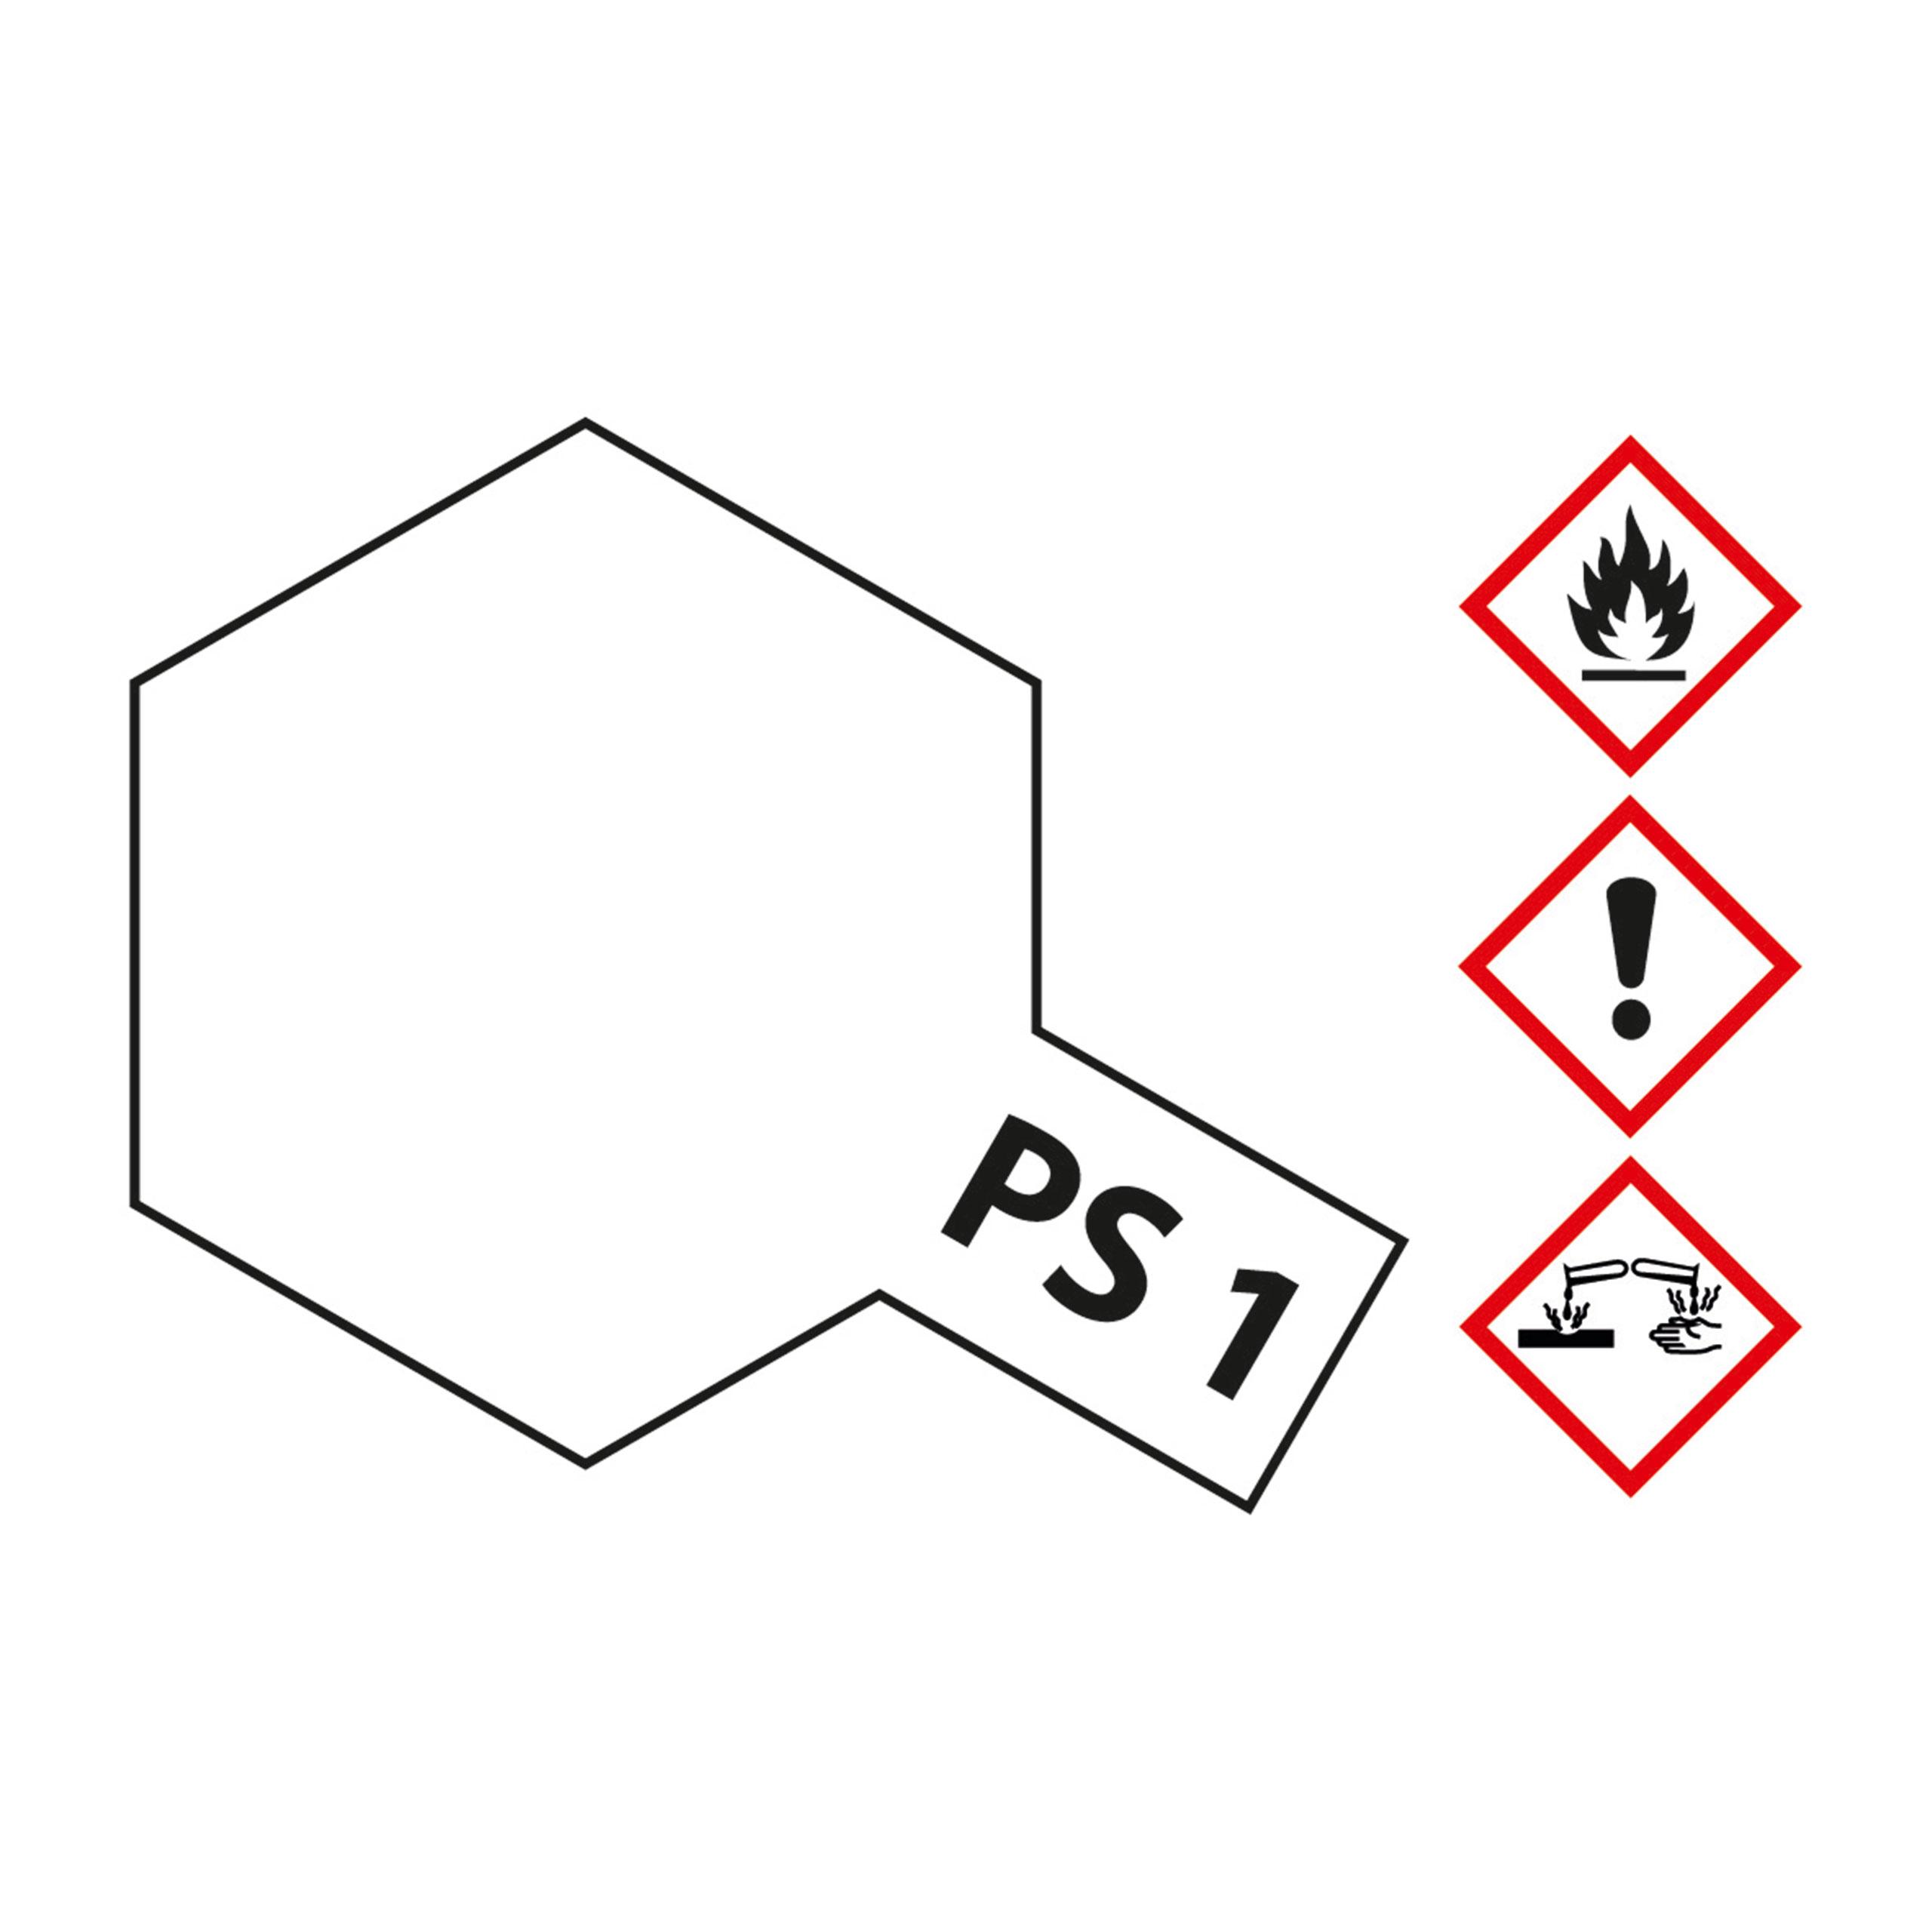 PS-1 Weiss Polycarbonat - 100ml Sprayfarbe Lexan - Tamiya 300086001